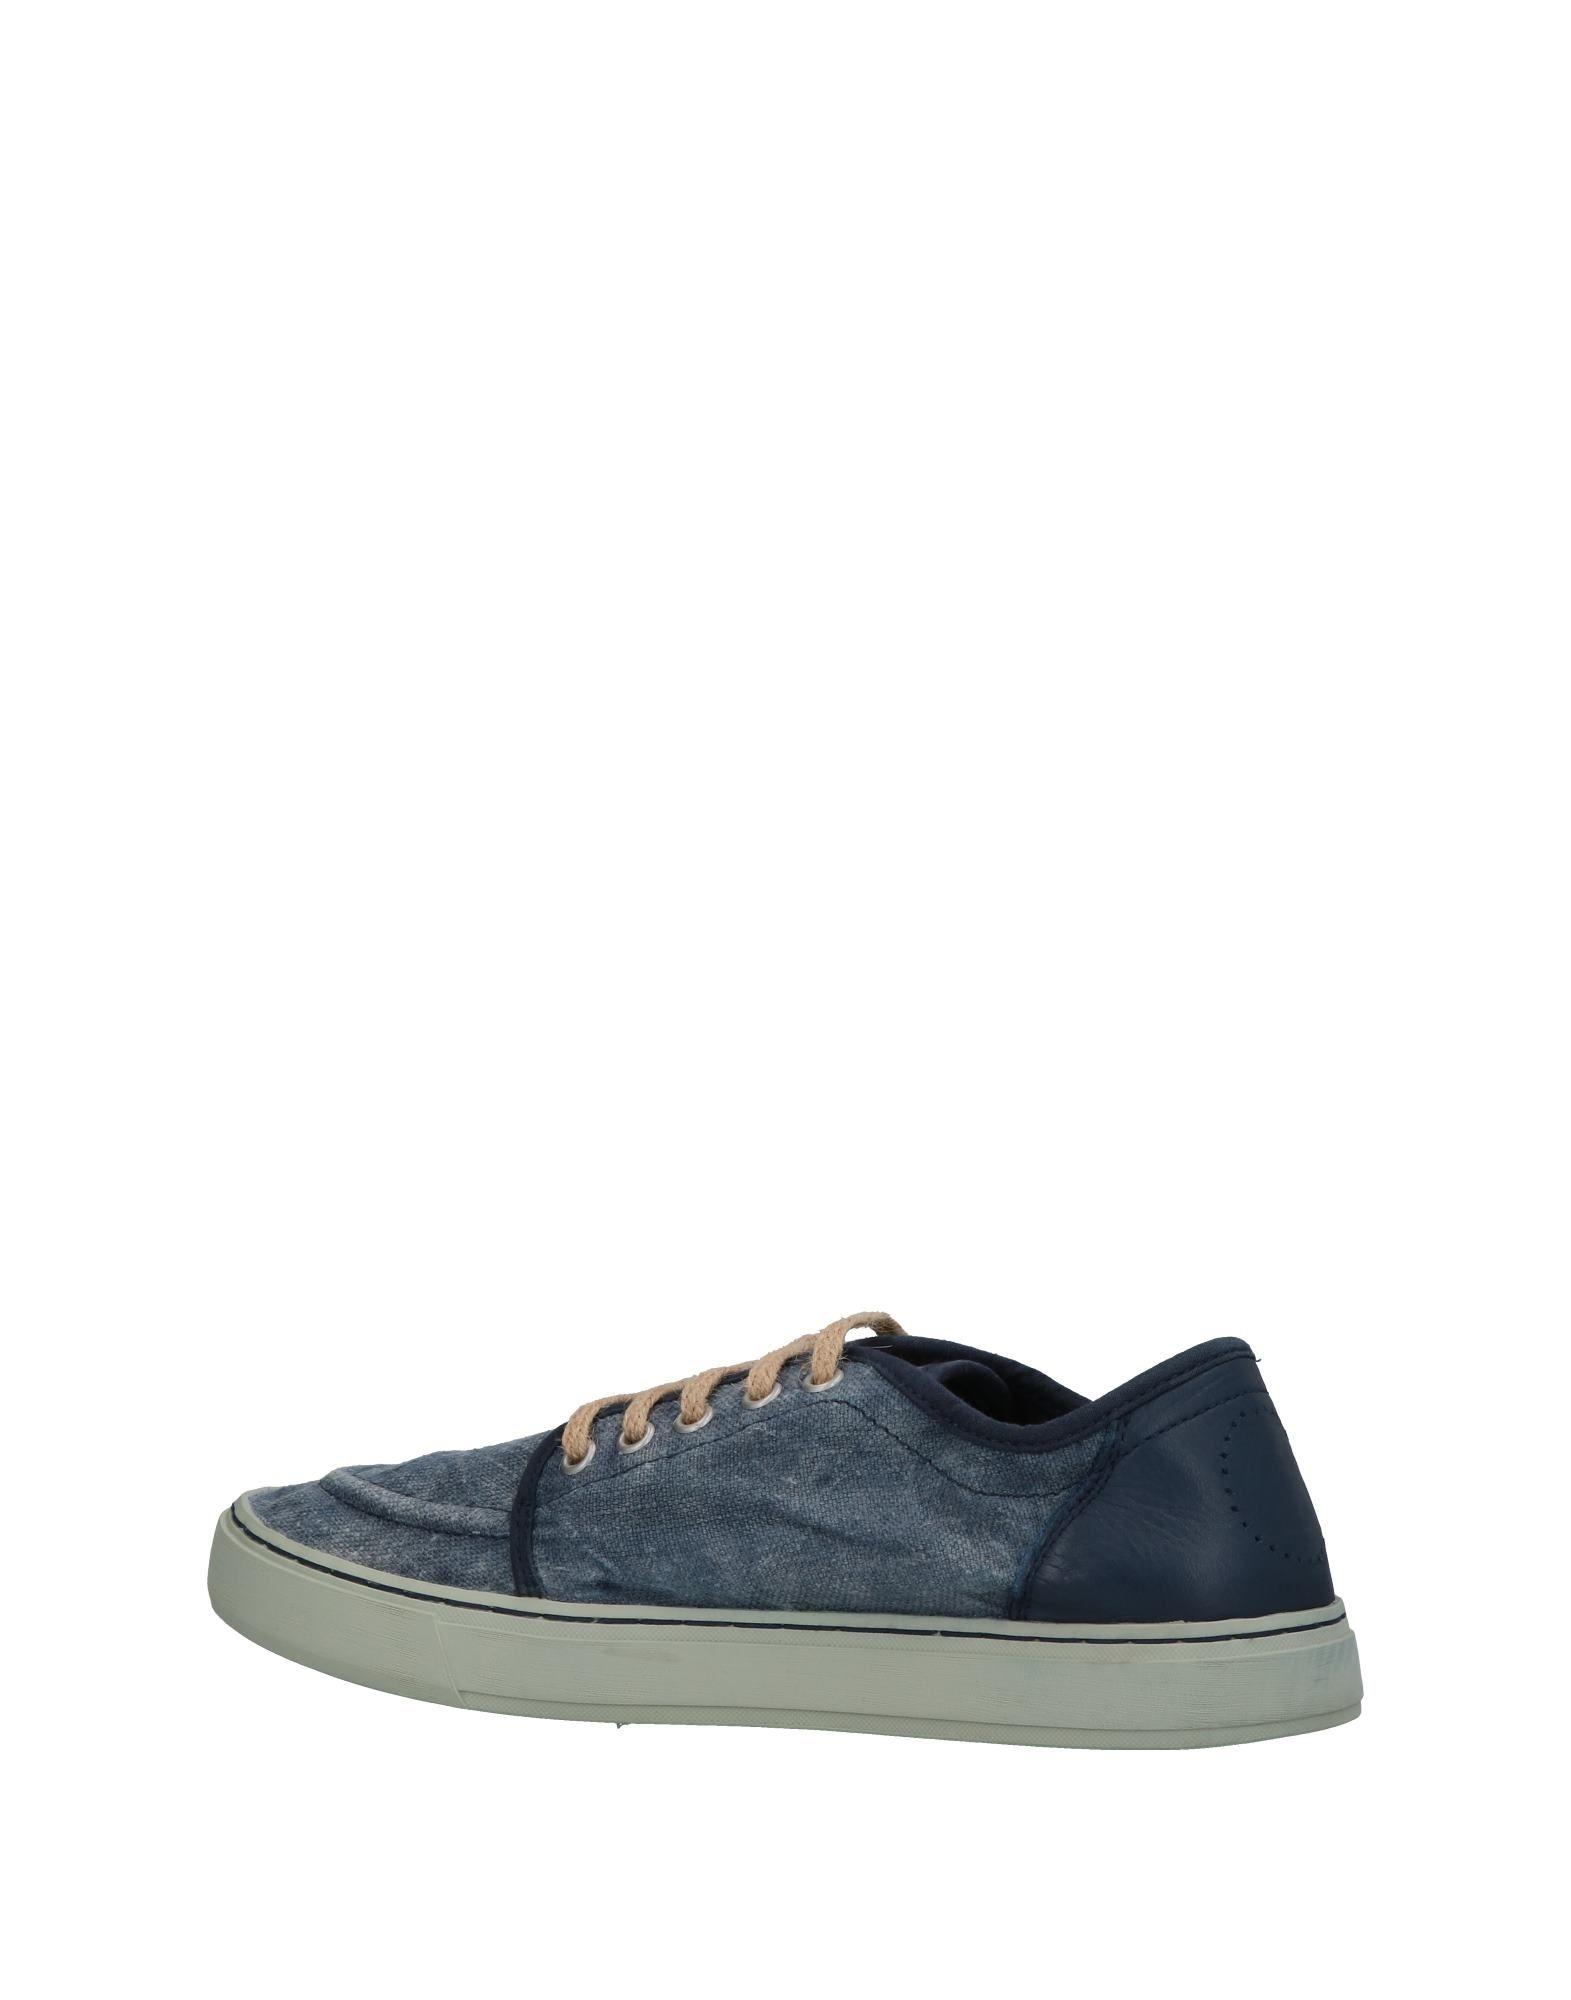 Sneakers Satorisan Homme - Sneakers Satorisan sur